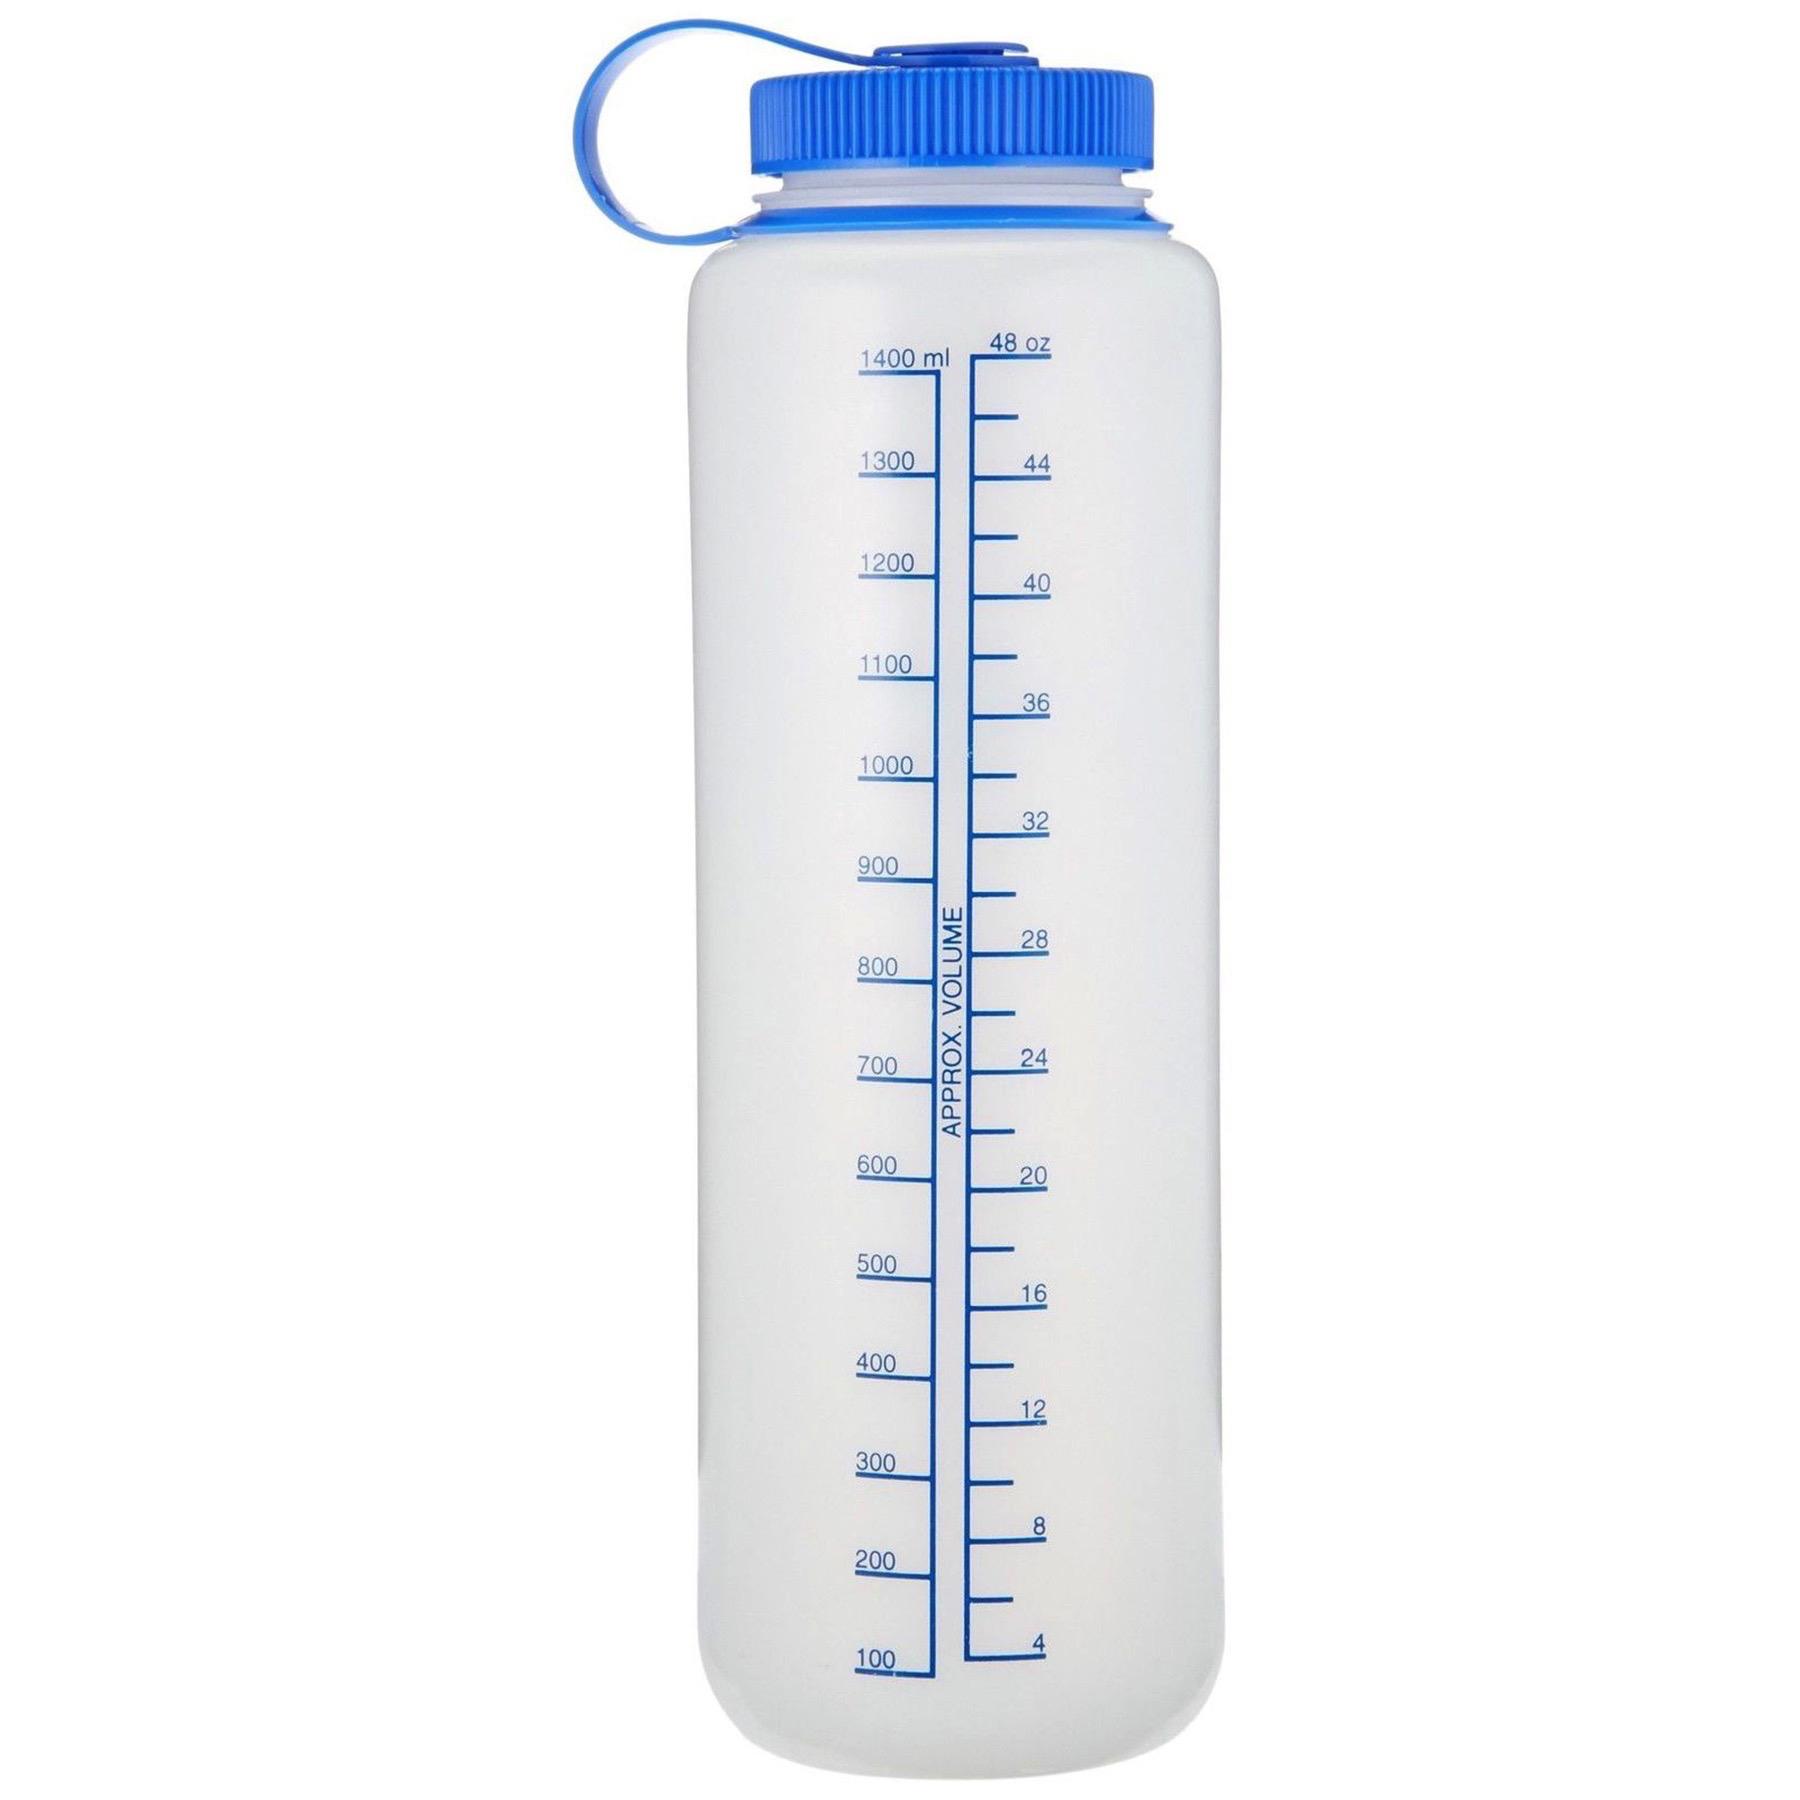 65d9a3134e Nalgene HDPE 48oz Silo Wide Mouth BPA-Free Water Bottle Outdoor Recreation